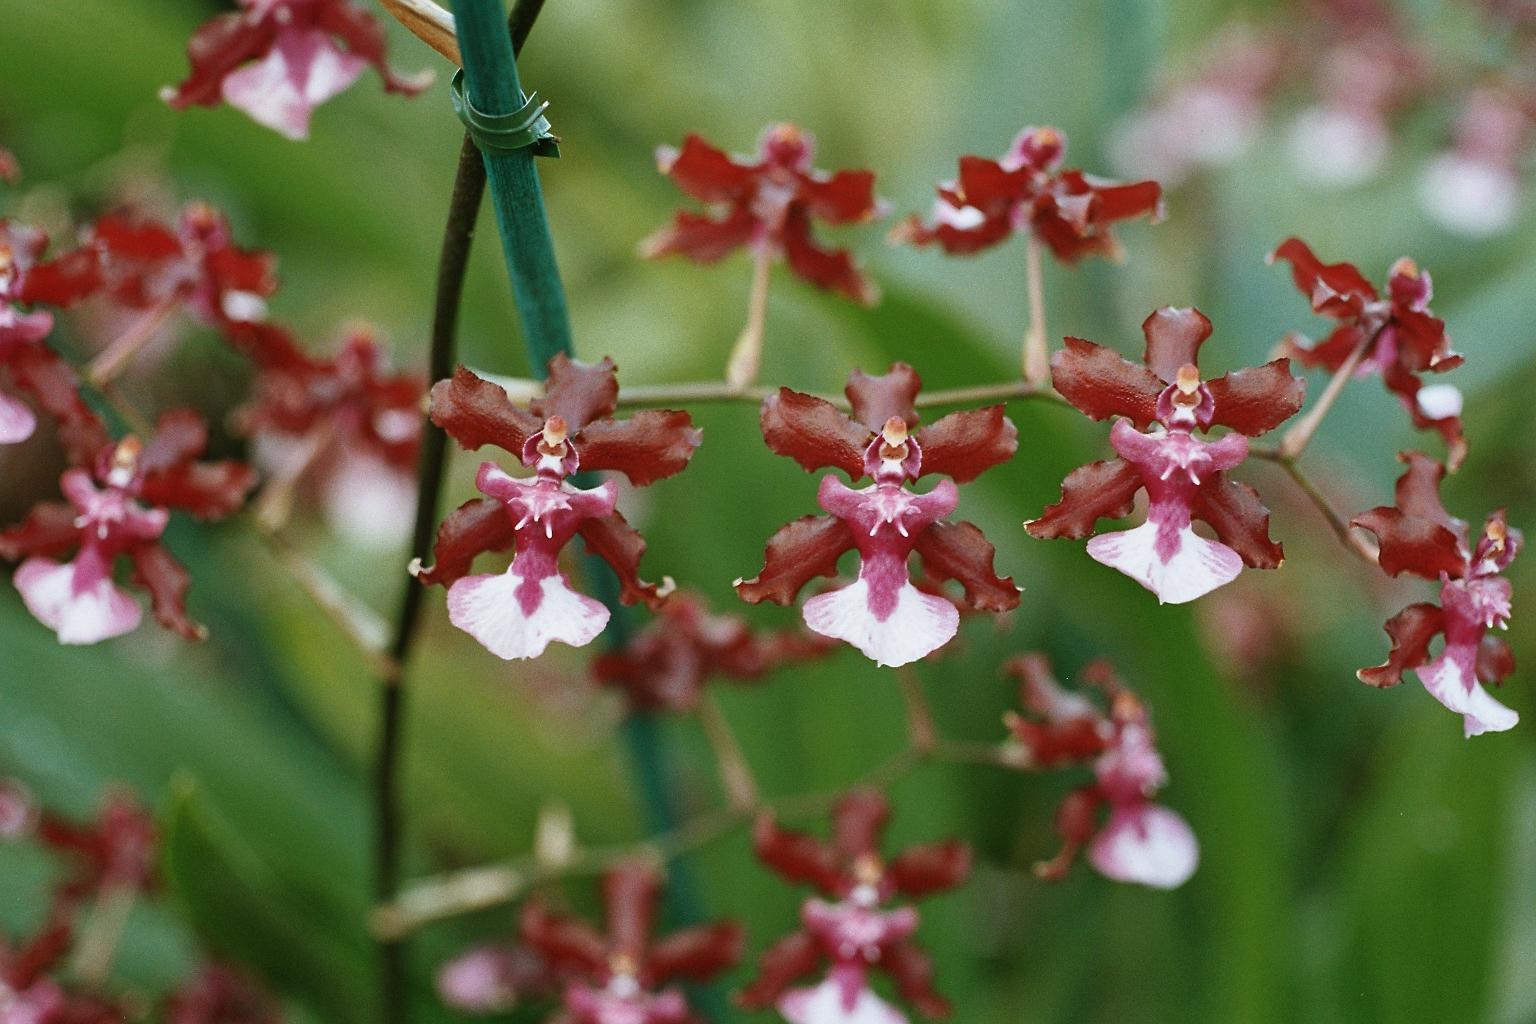 http://upload.wikimedia.org/wikipedia/commons/c/c5/A_and_B_Larsen_orchids_-_Oncidium_Sharry_Baby_1063-21.jpg